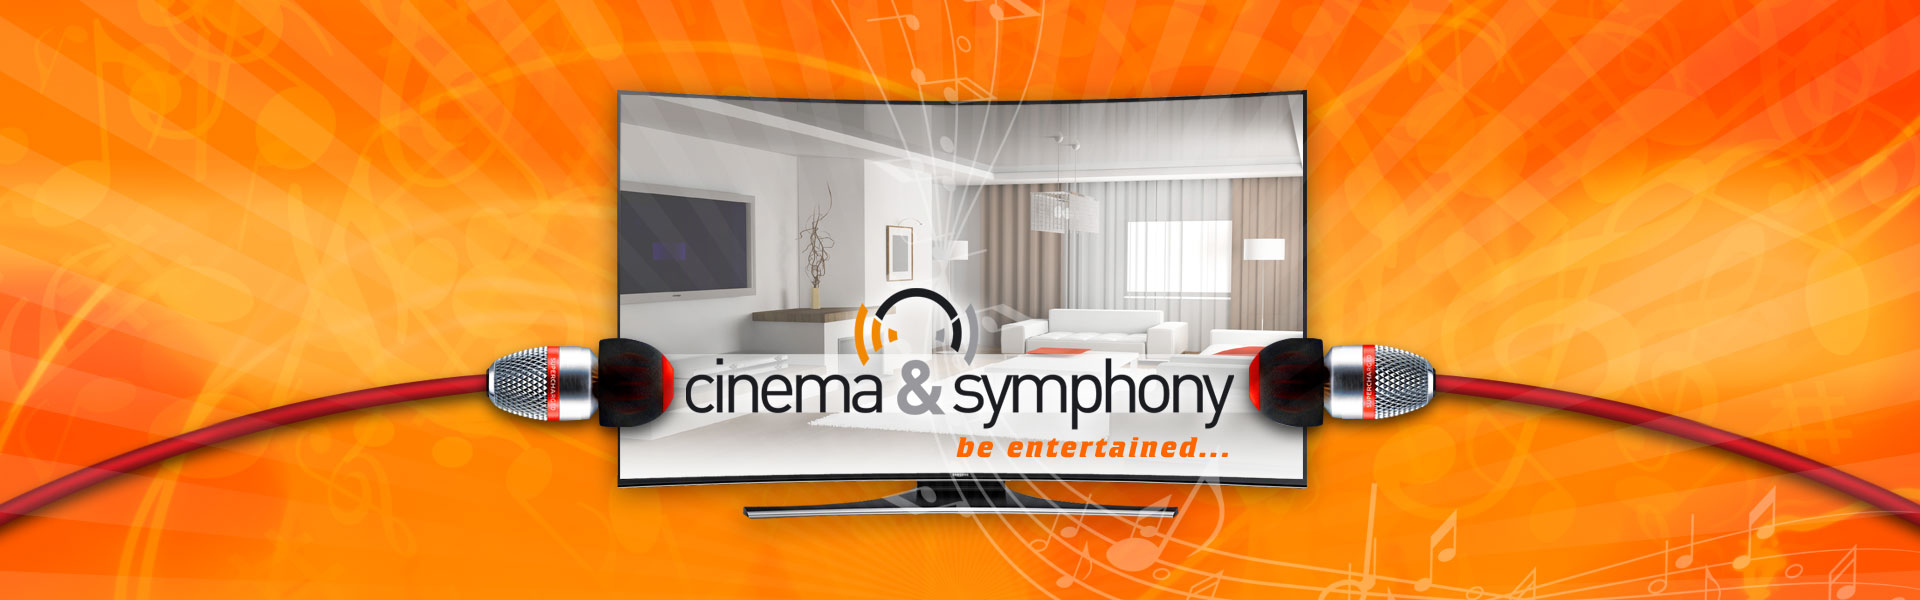 Cinema Symphony Slider